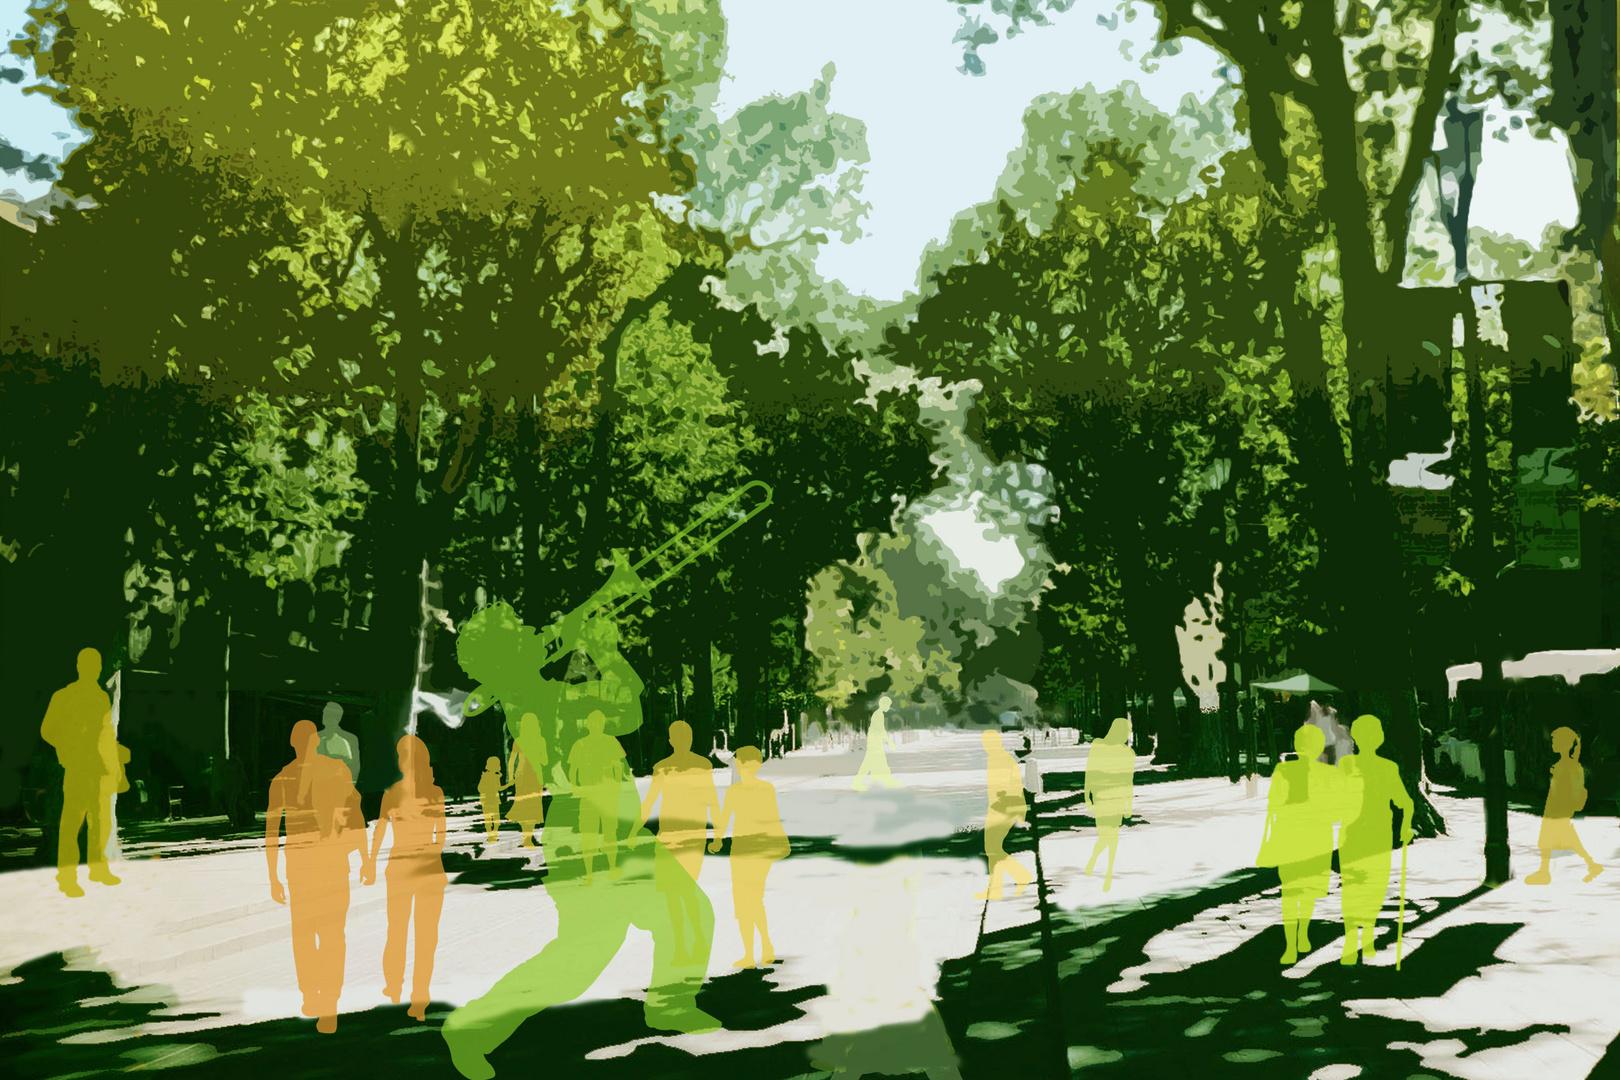 Spaziergänger in Aix